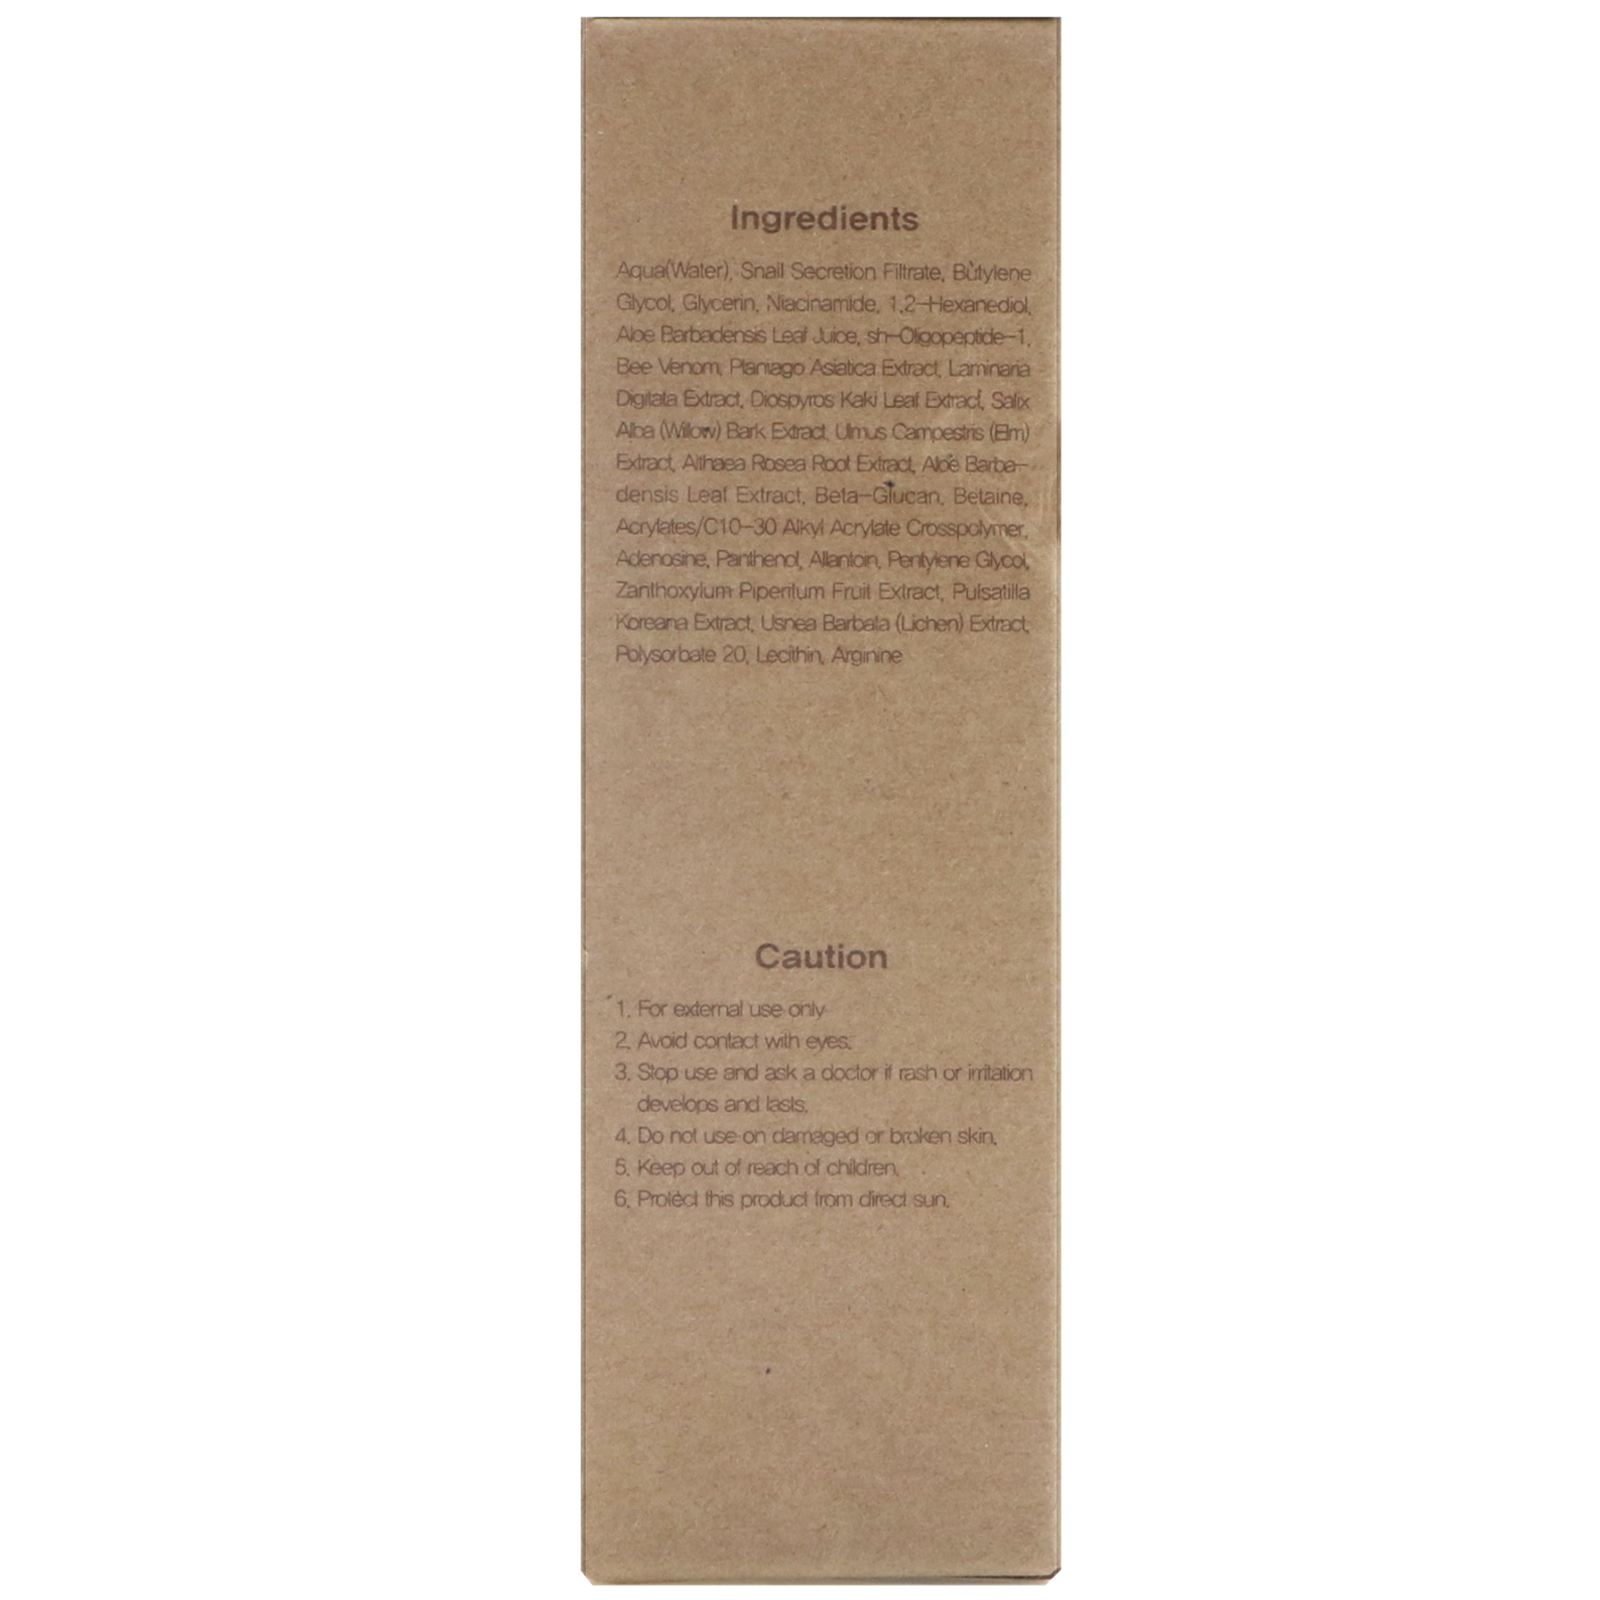 Benton, Snail Bee High Content Essence, 2 02 fl oz (60 ml